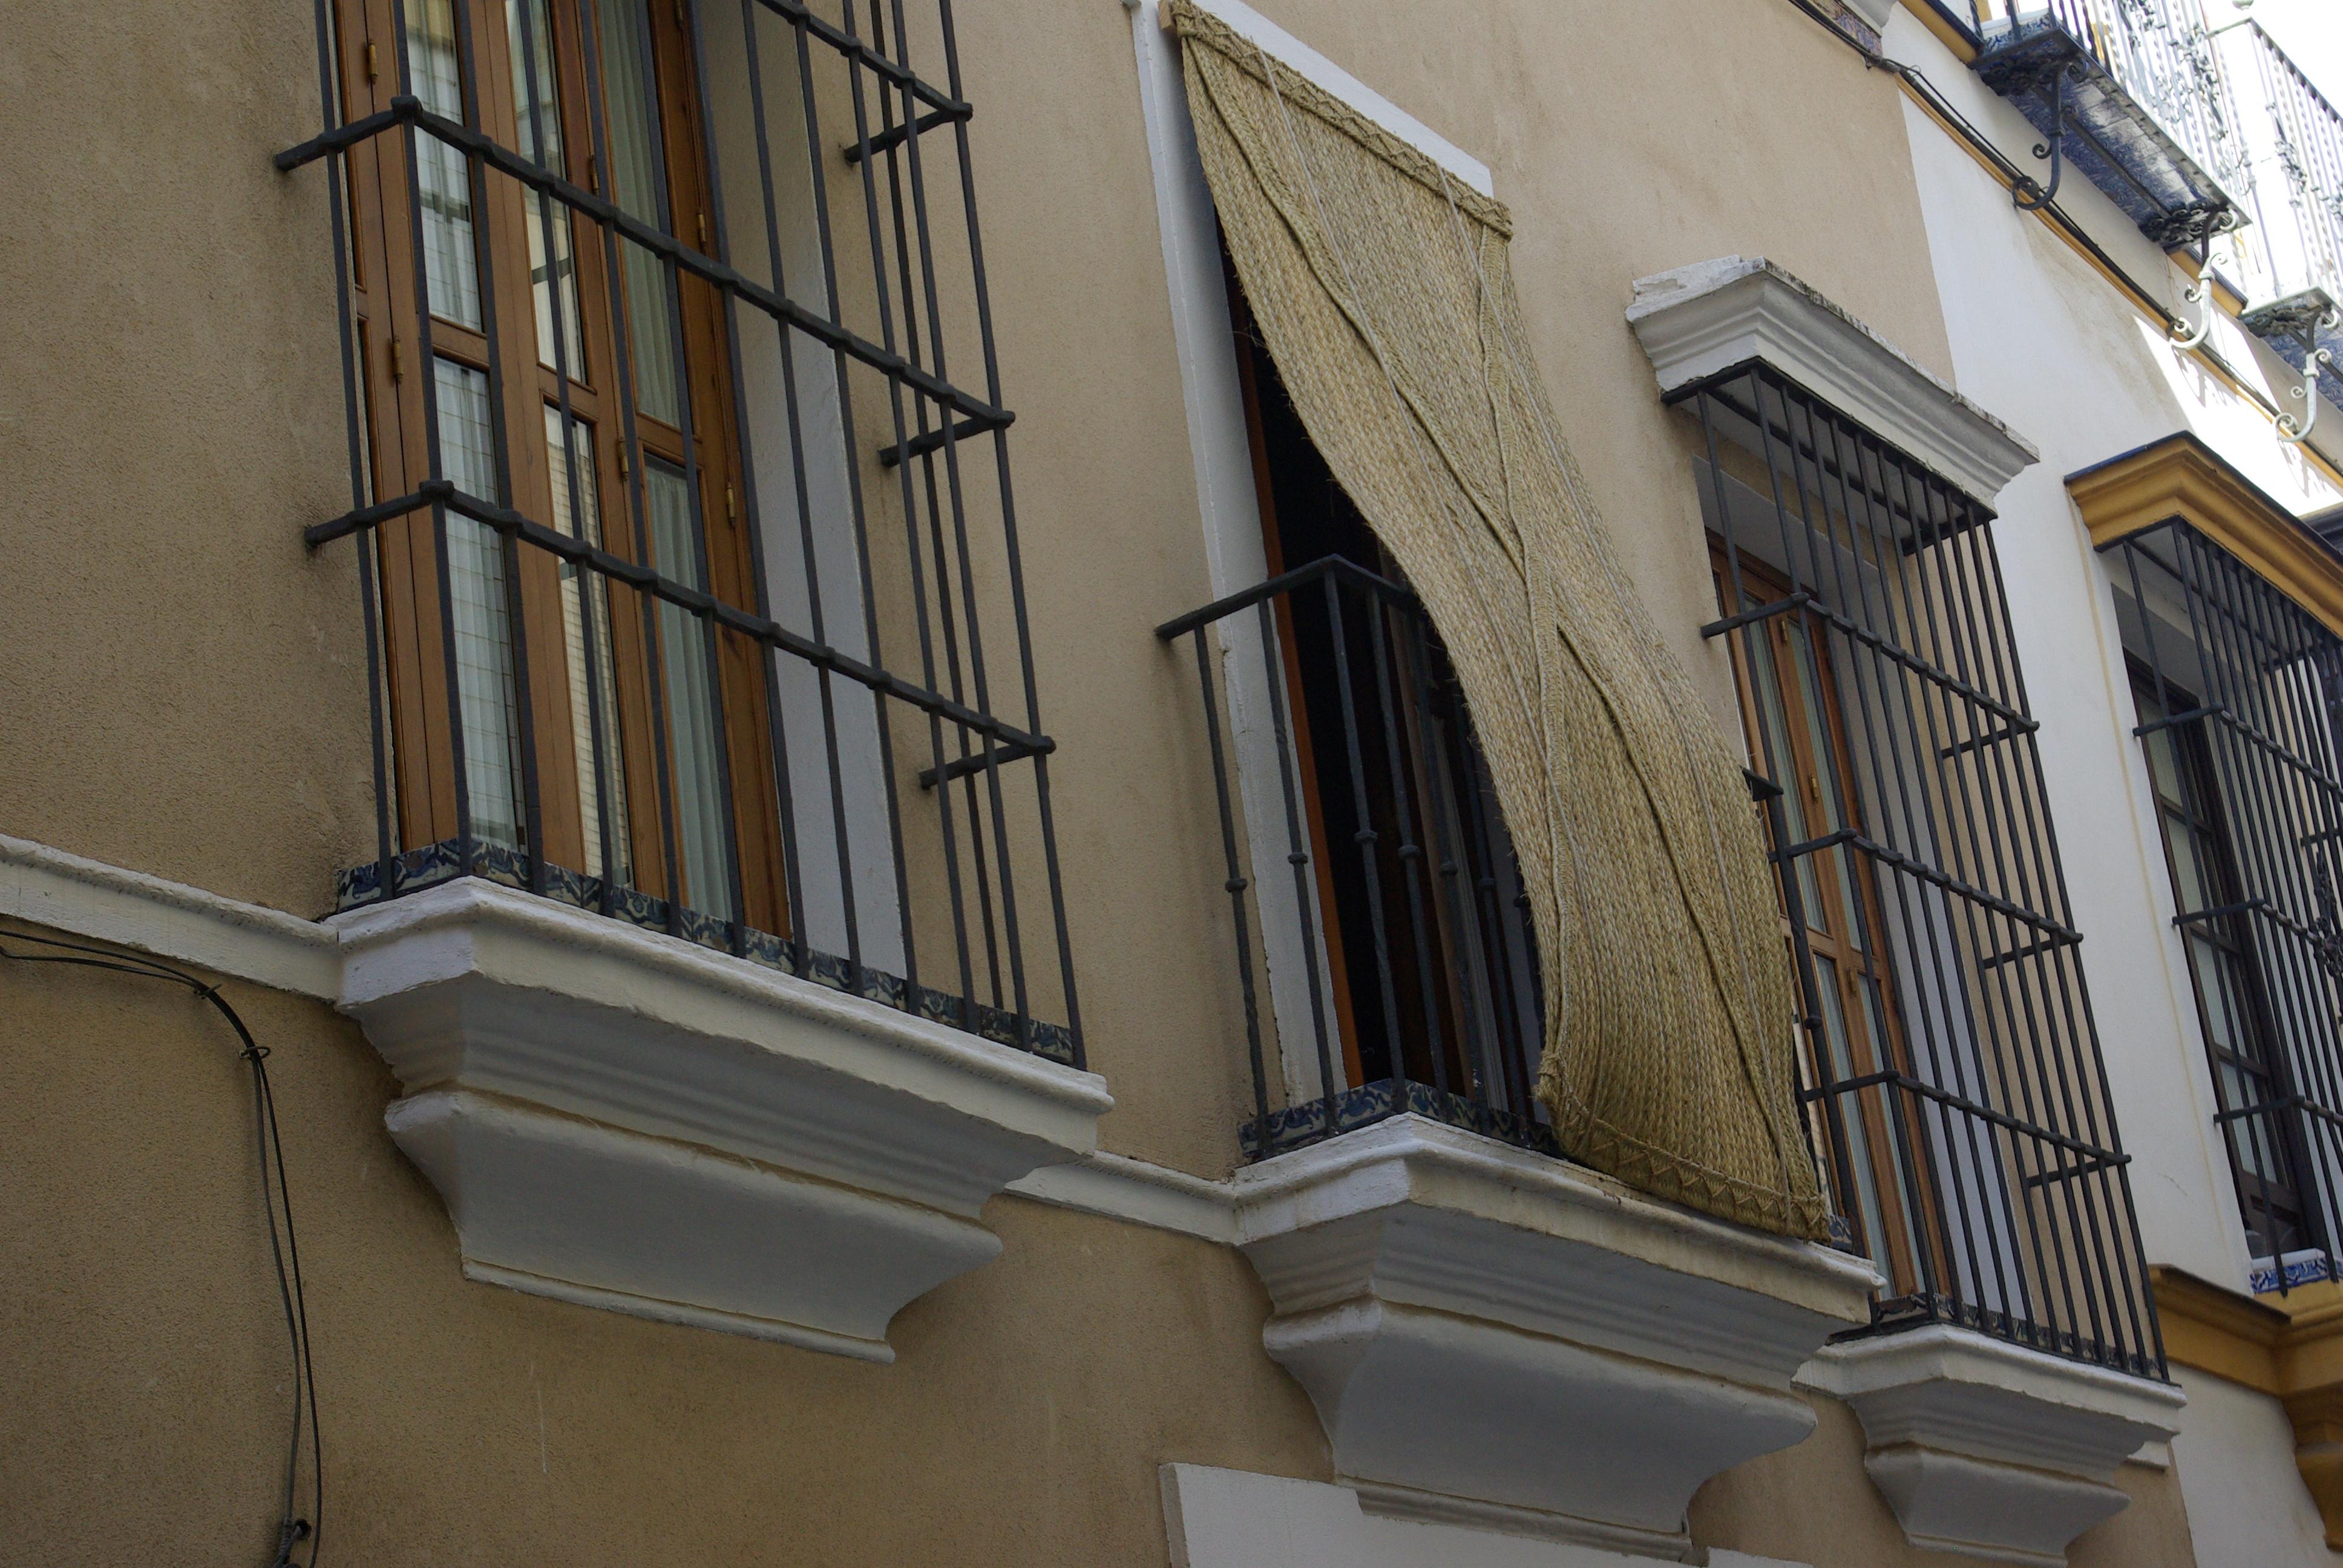 1. FACHADA 2 - Casa paez Sevilla